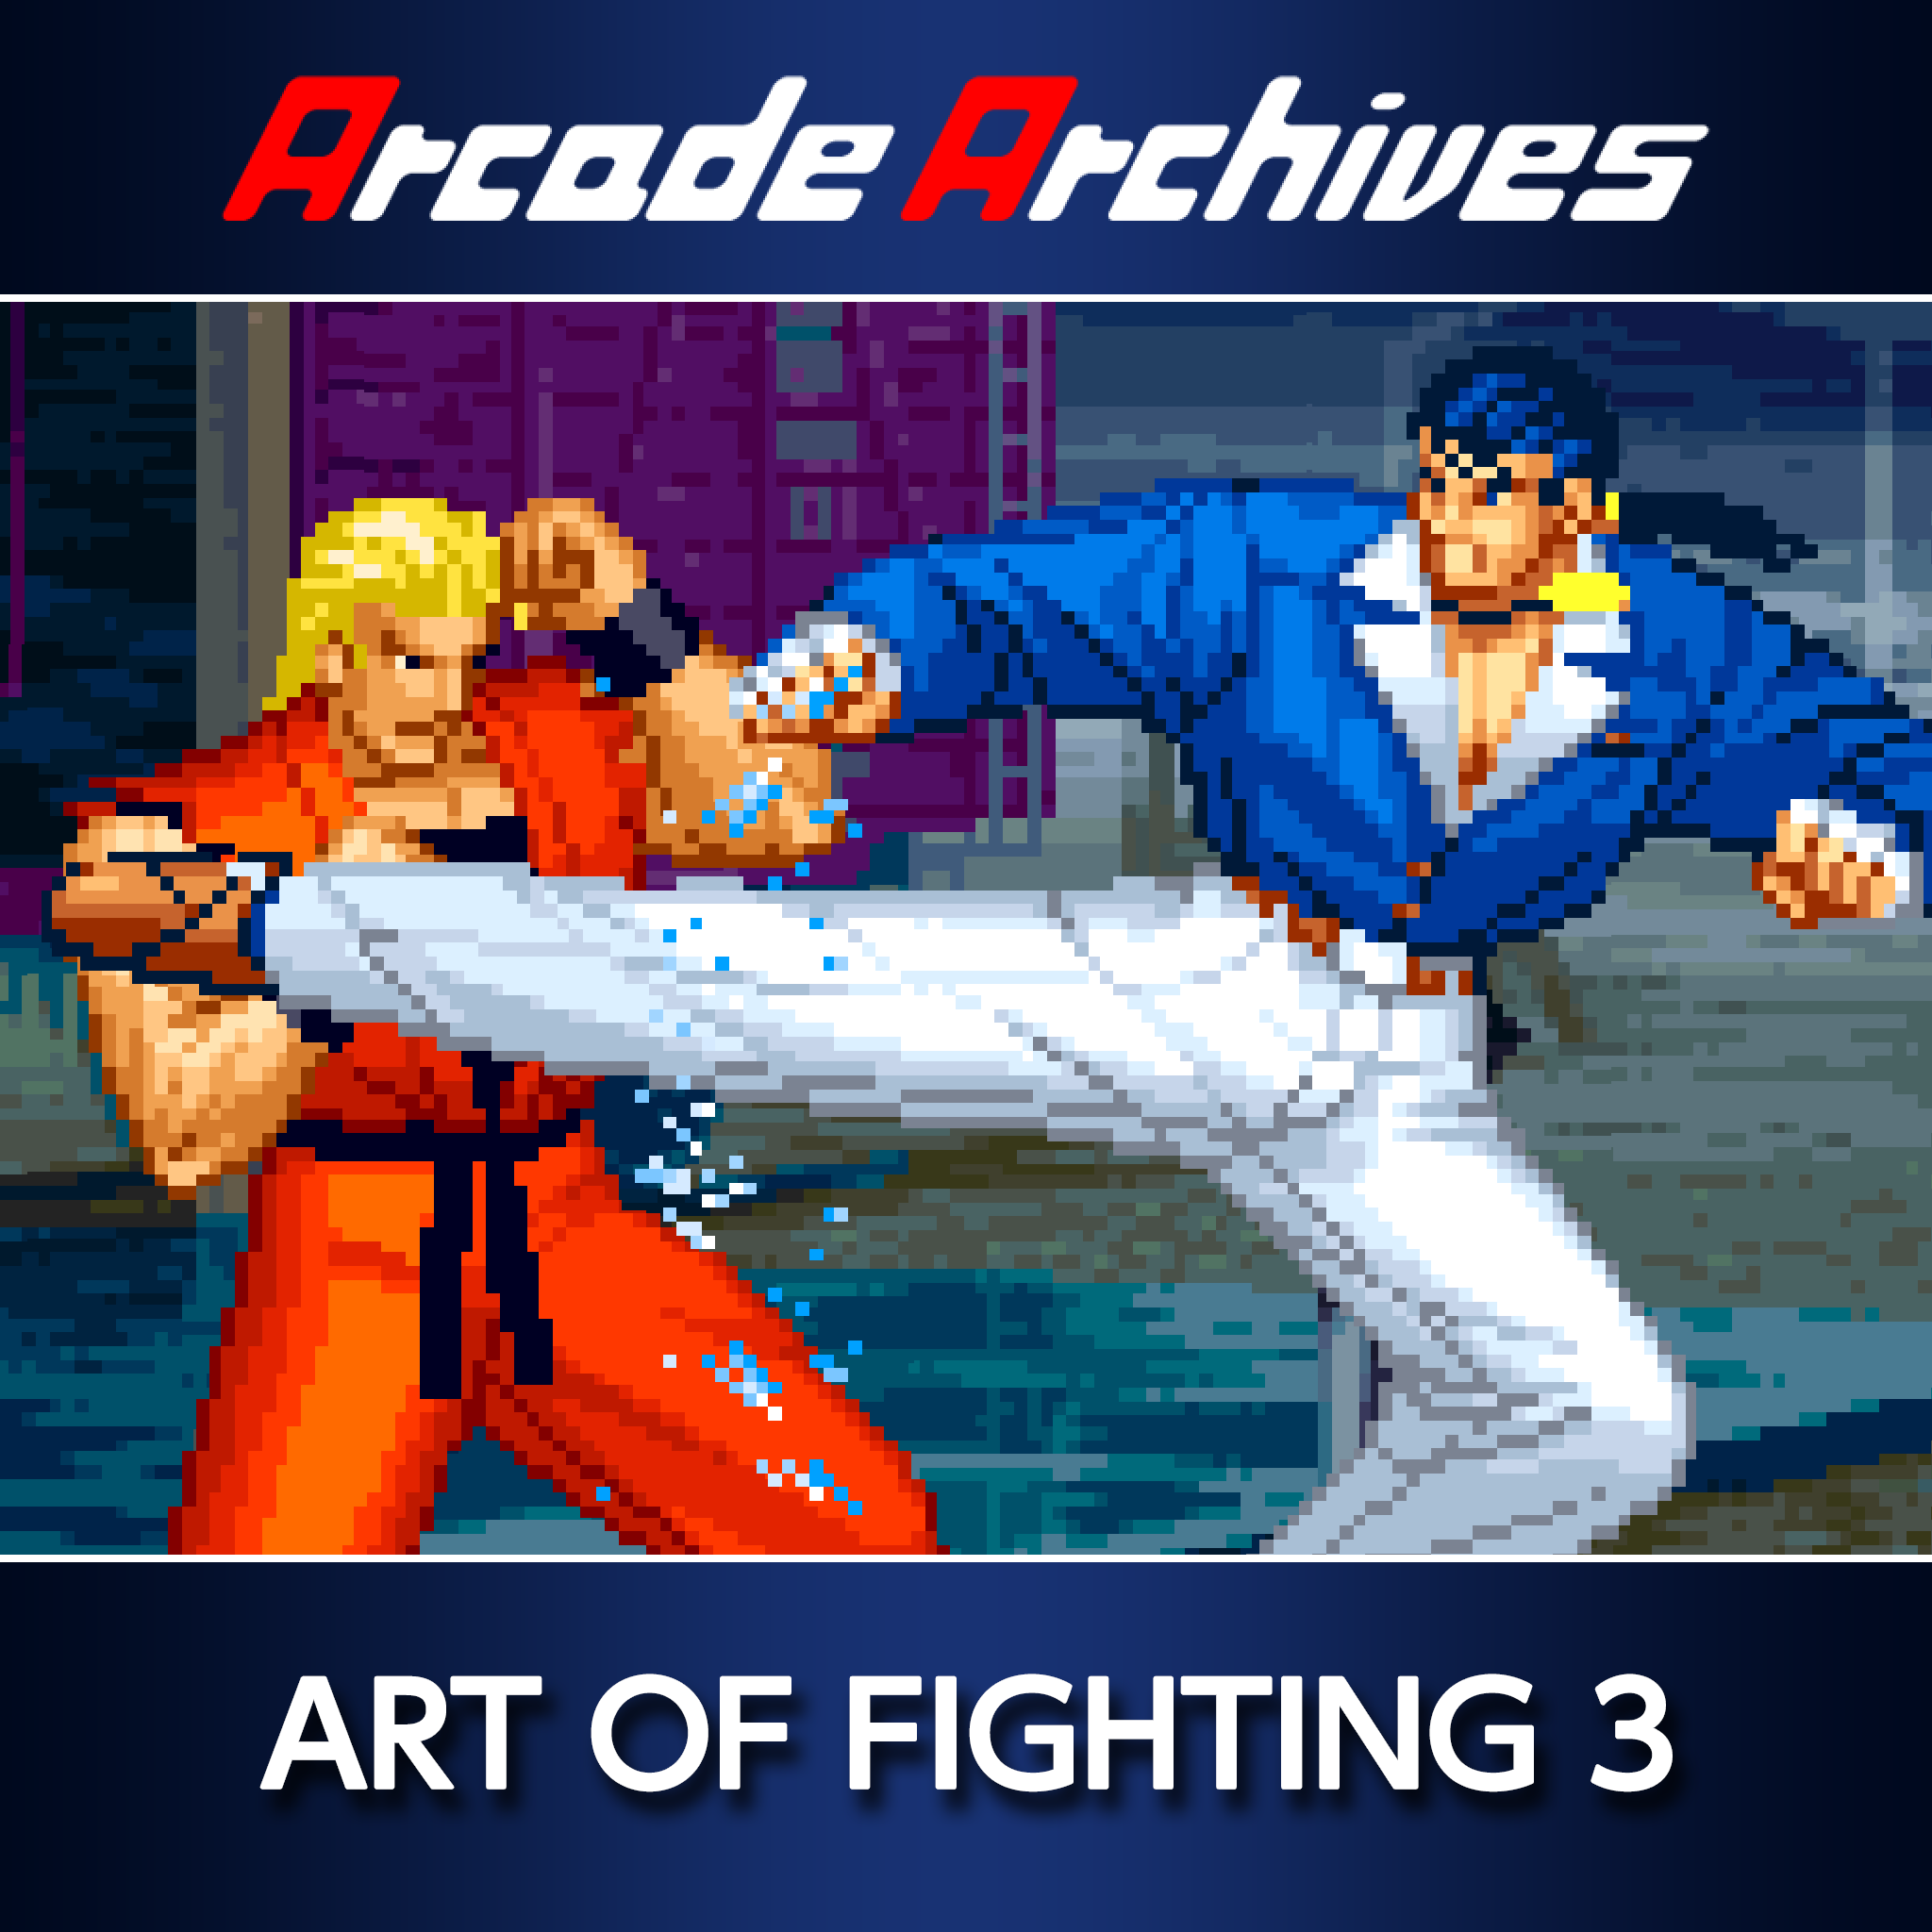 Aca Neogeo Art Of Fighting 3 Ps4 Price History Ps Store Canada